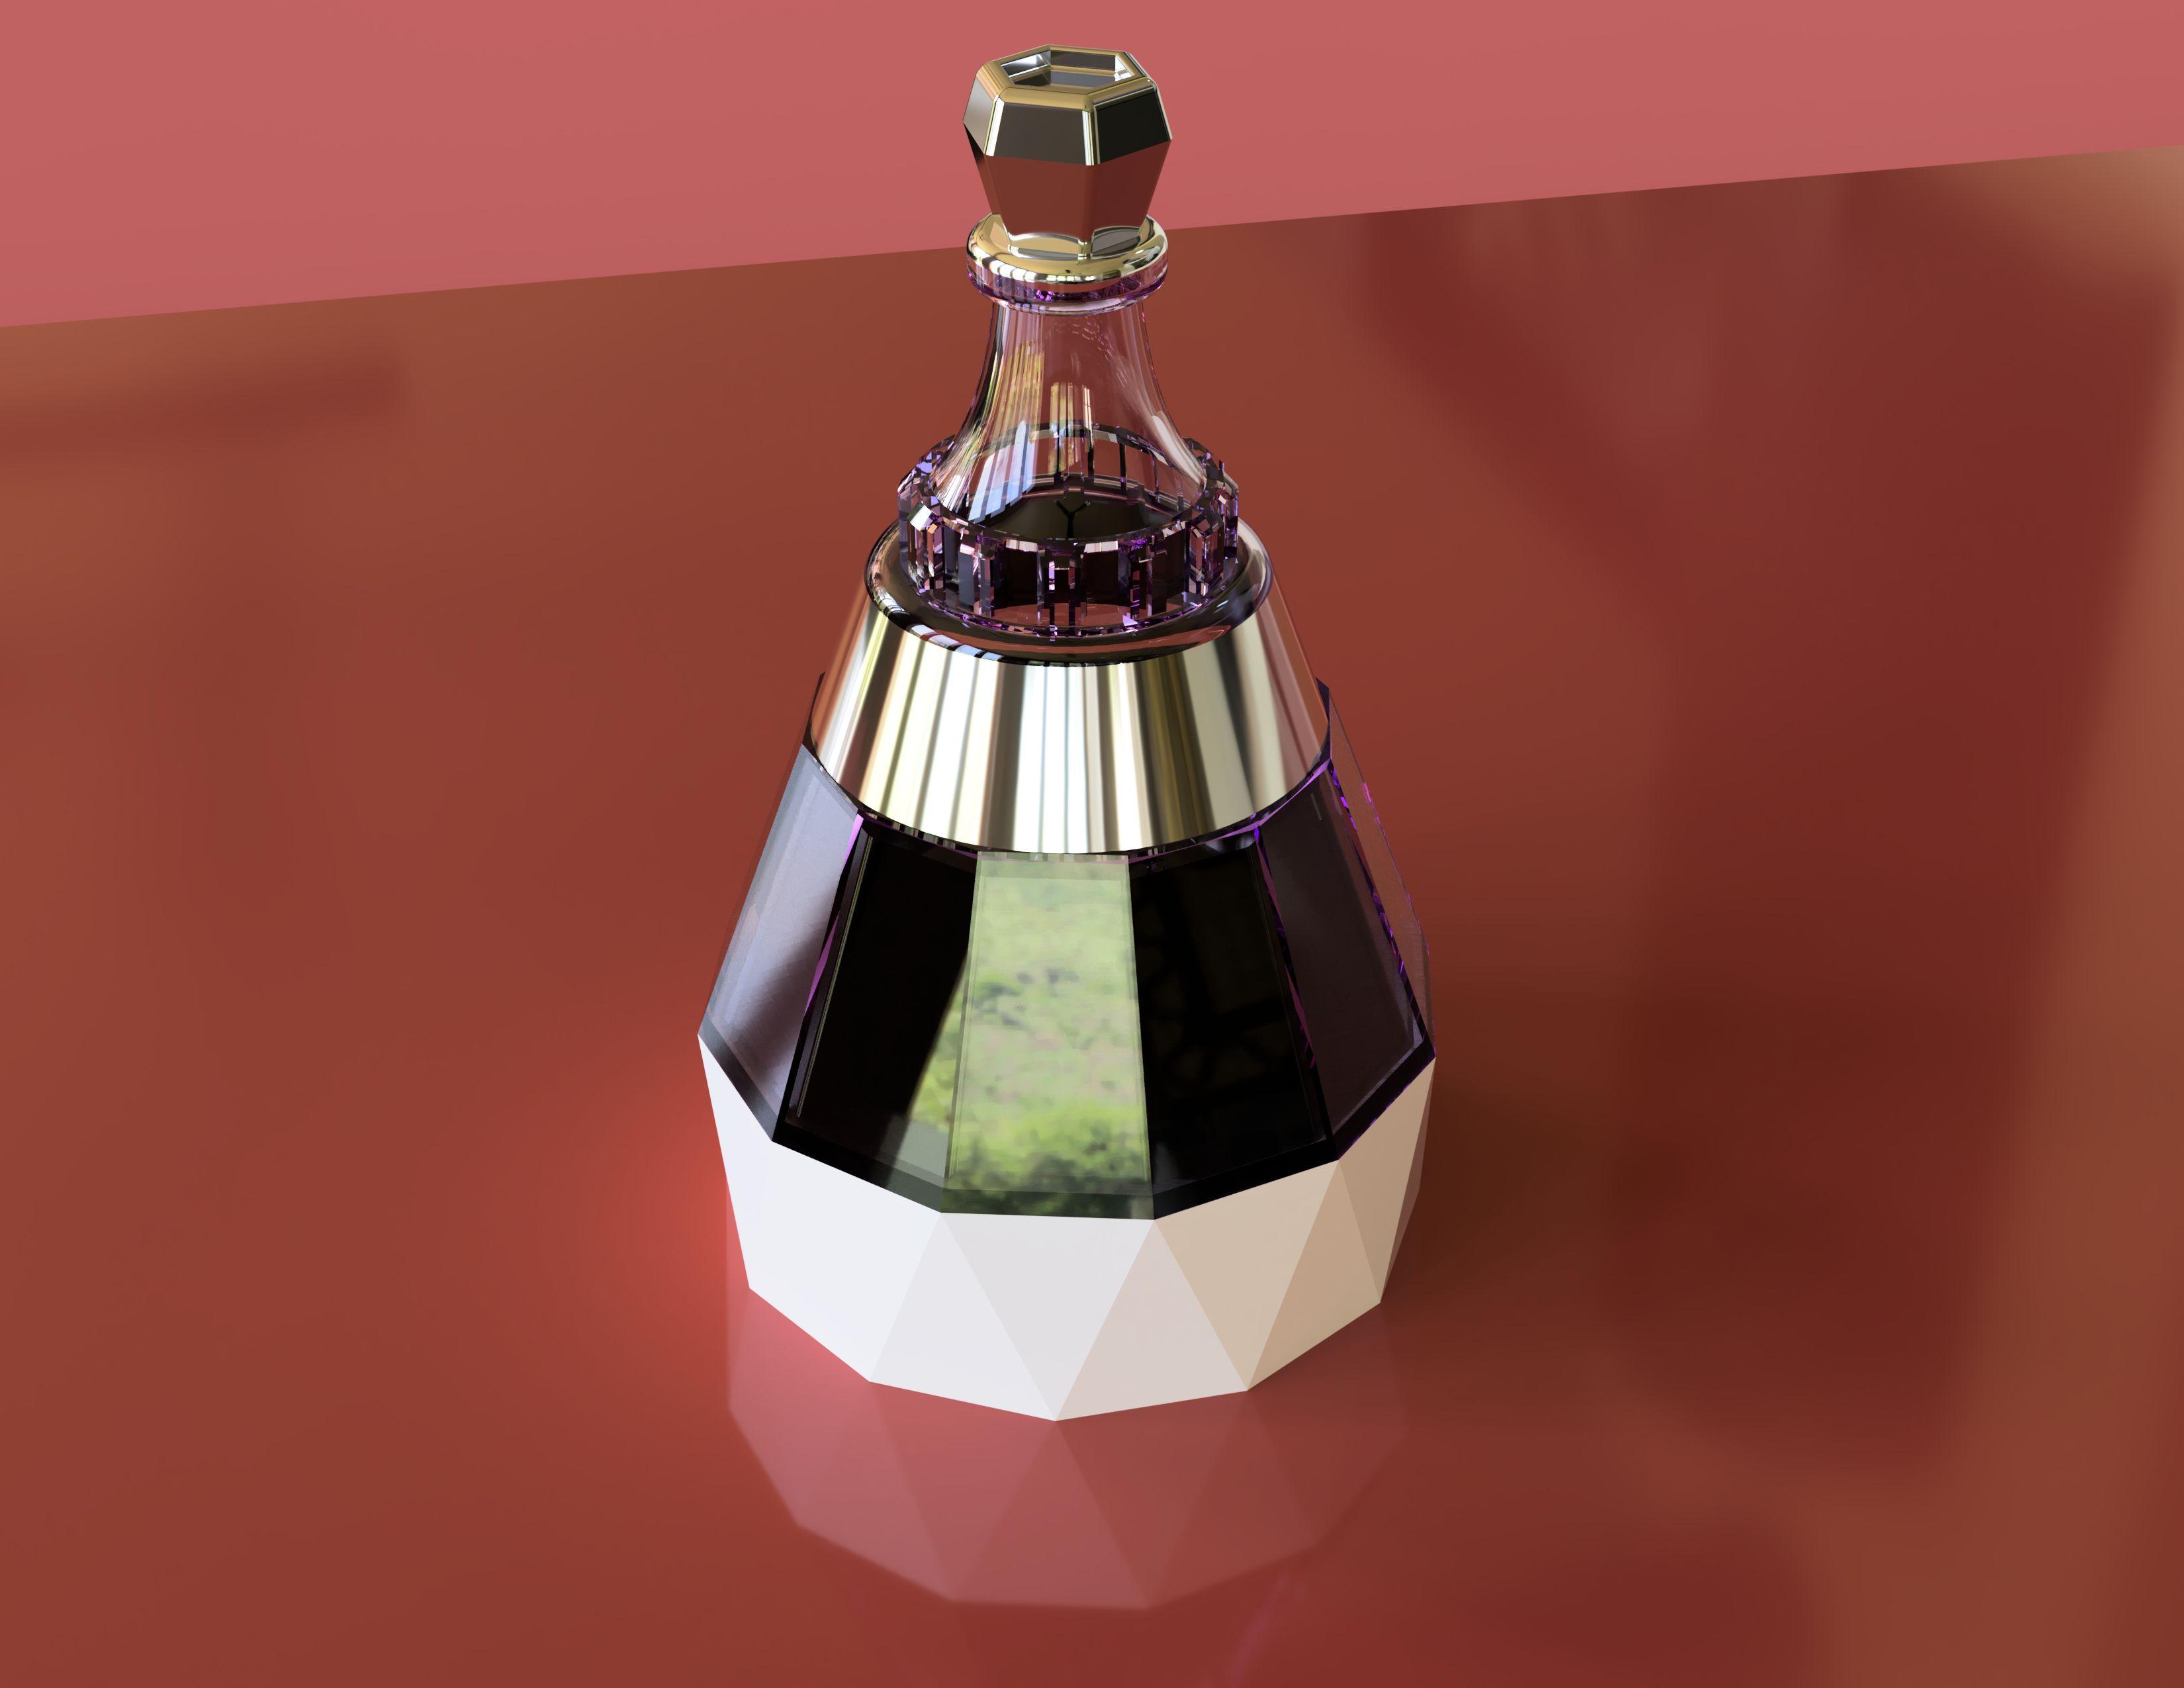 Botella-1-2020-jan-21-03-39-04am-000-customizedview13051561156-png-3500-3500